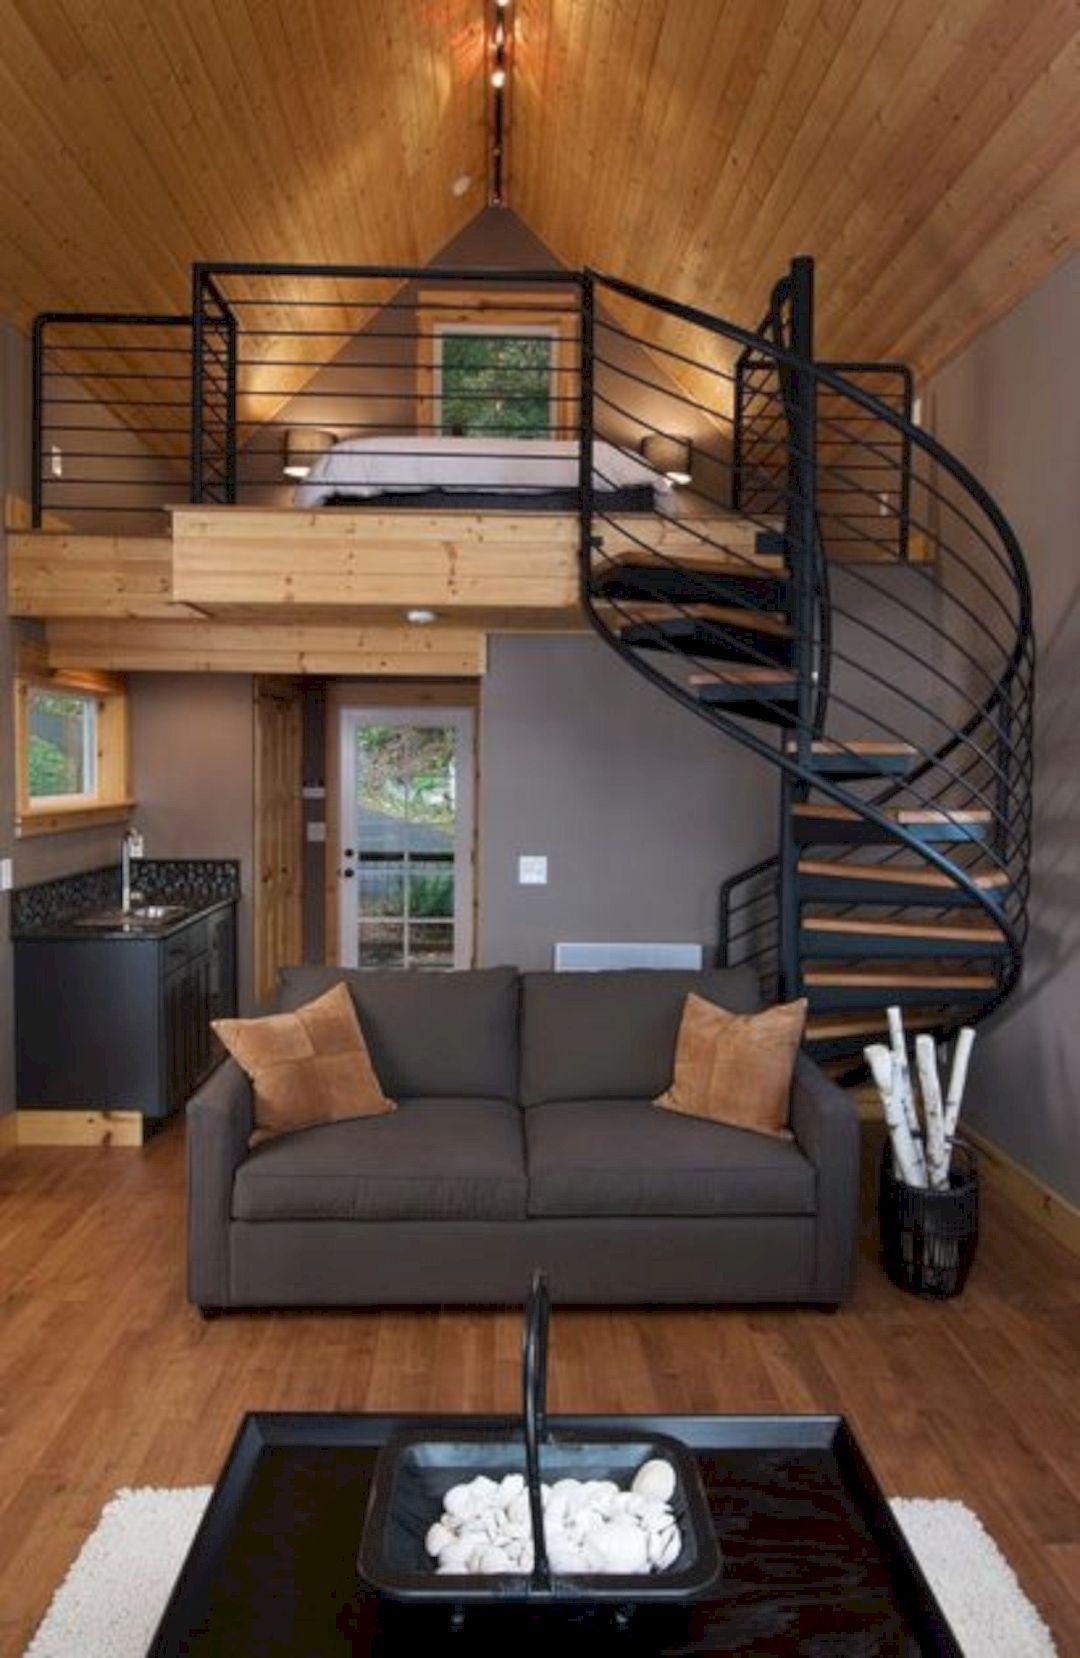 15 Amazing Interior Design Ideas For Modern Loft Tiny House